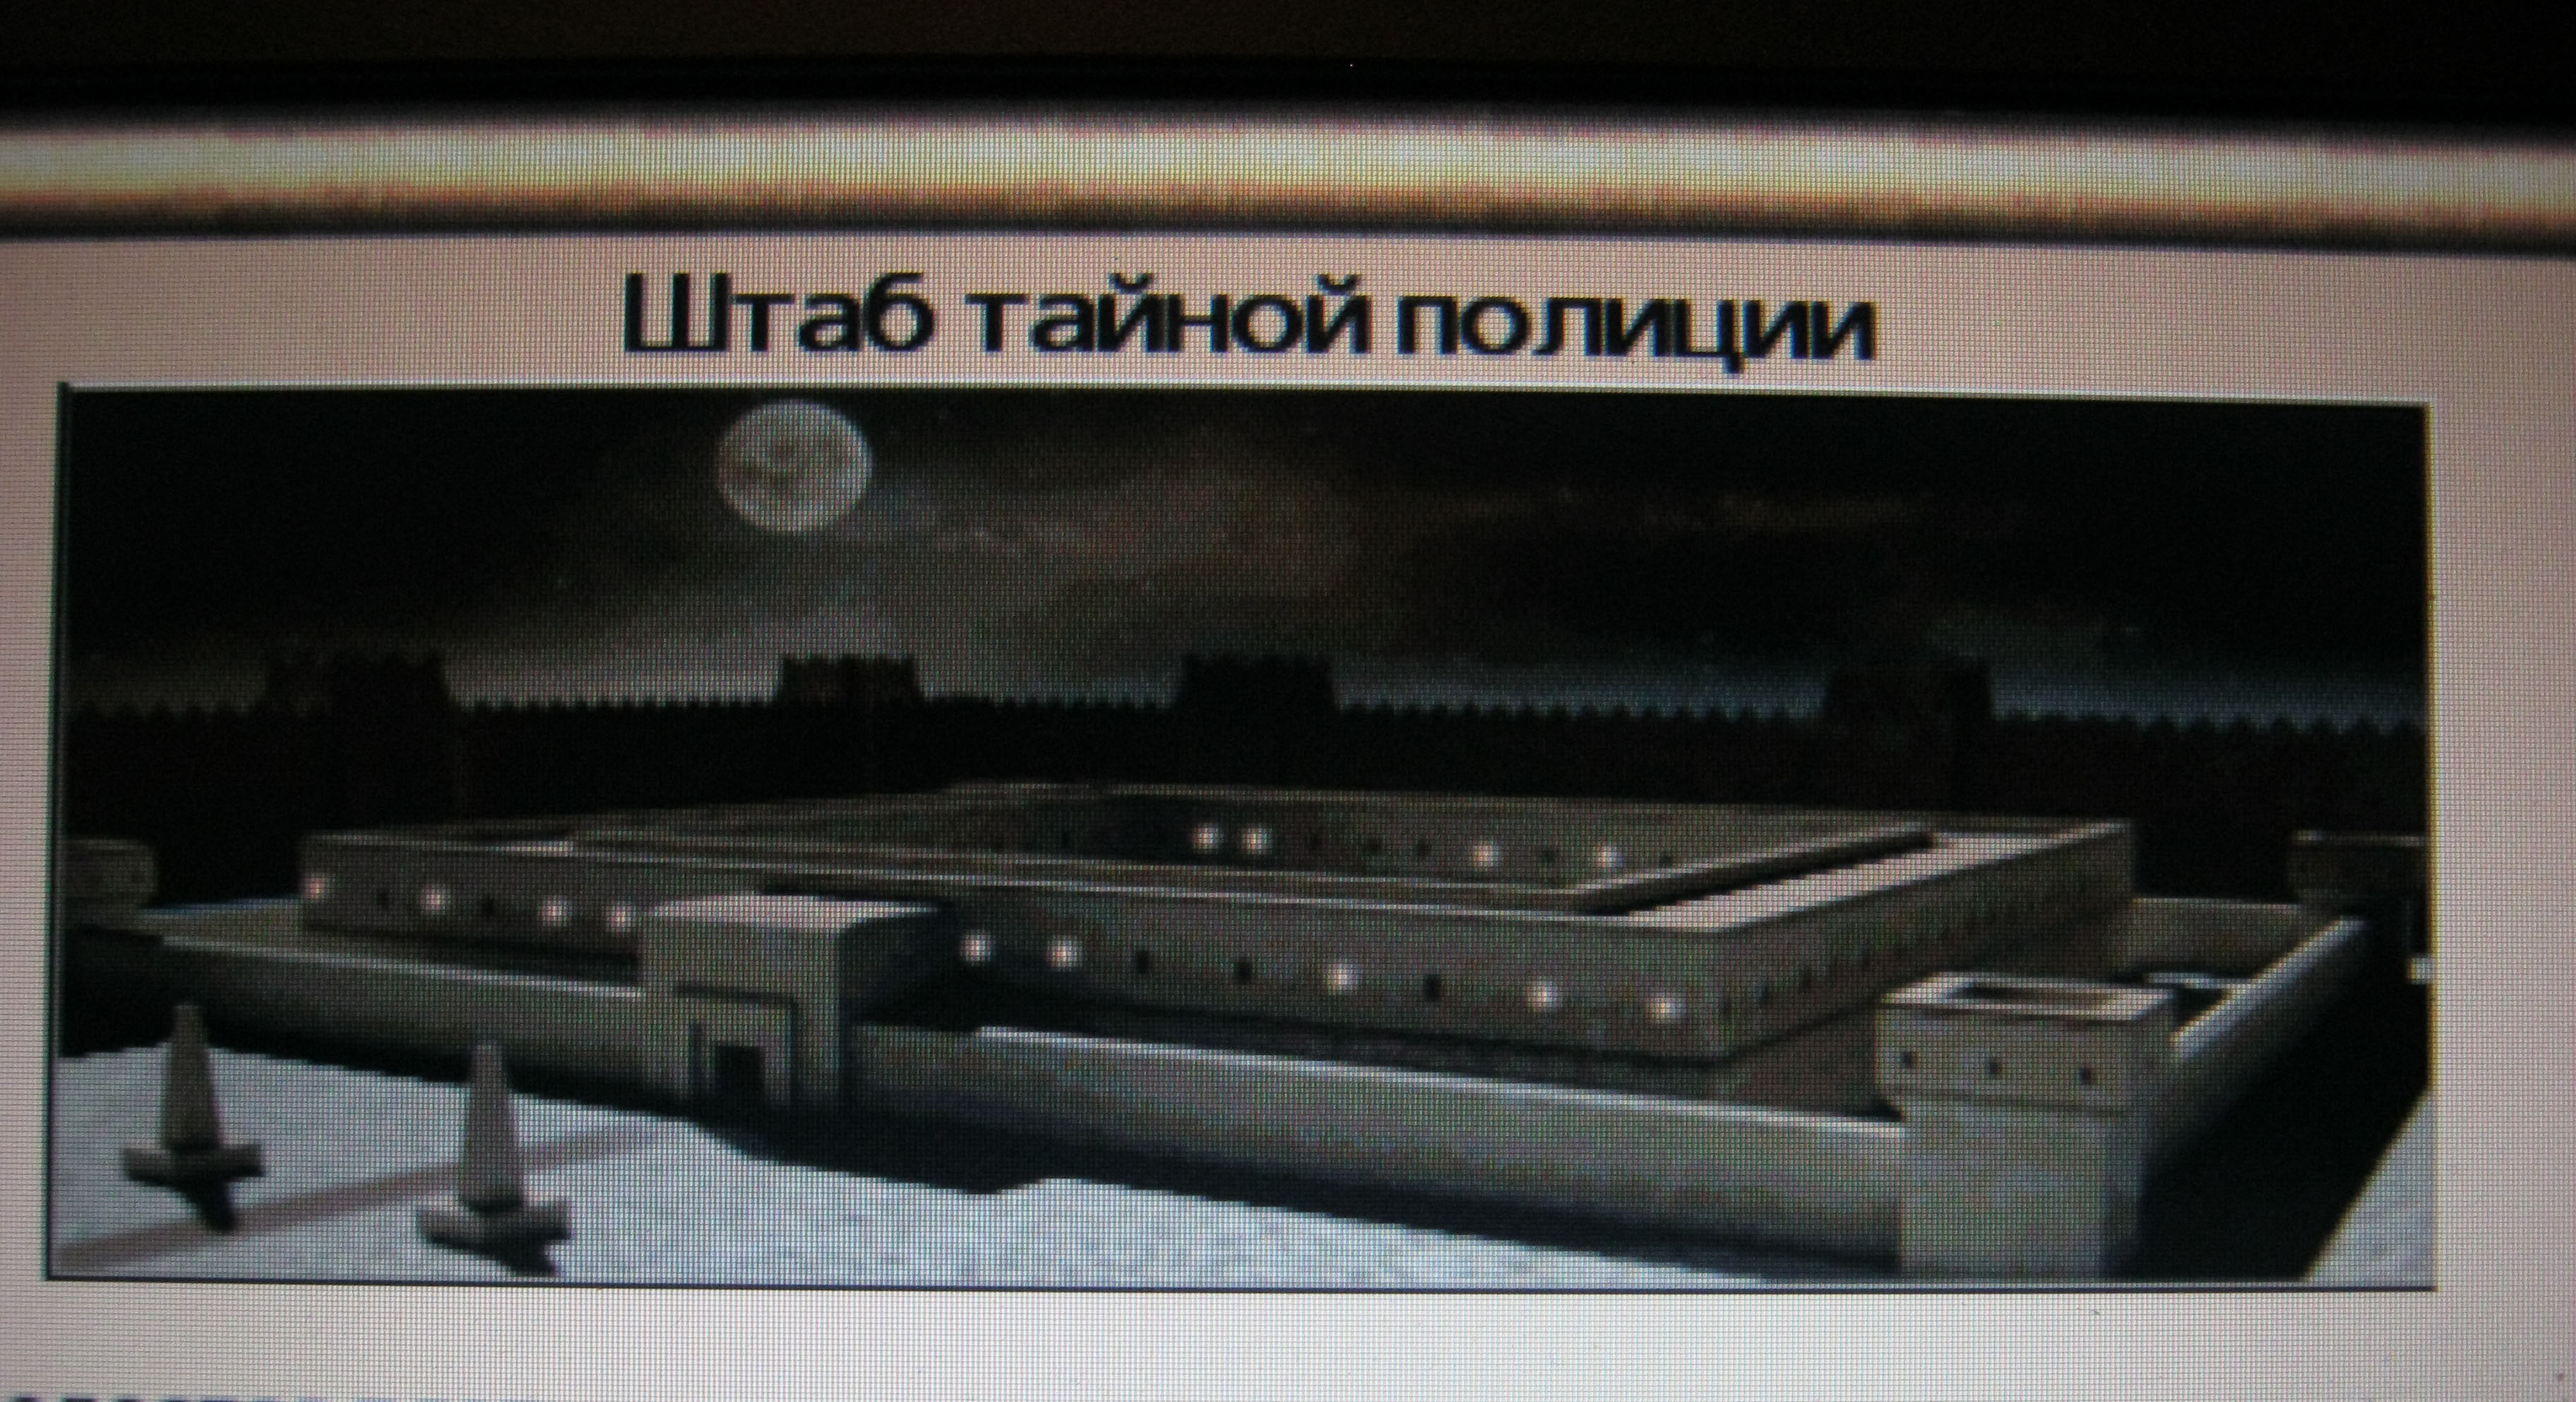 2012 033